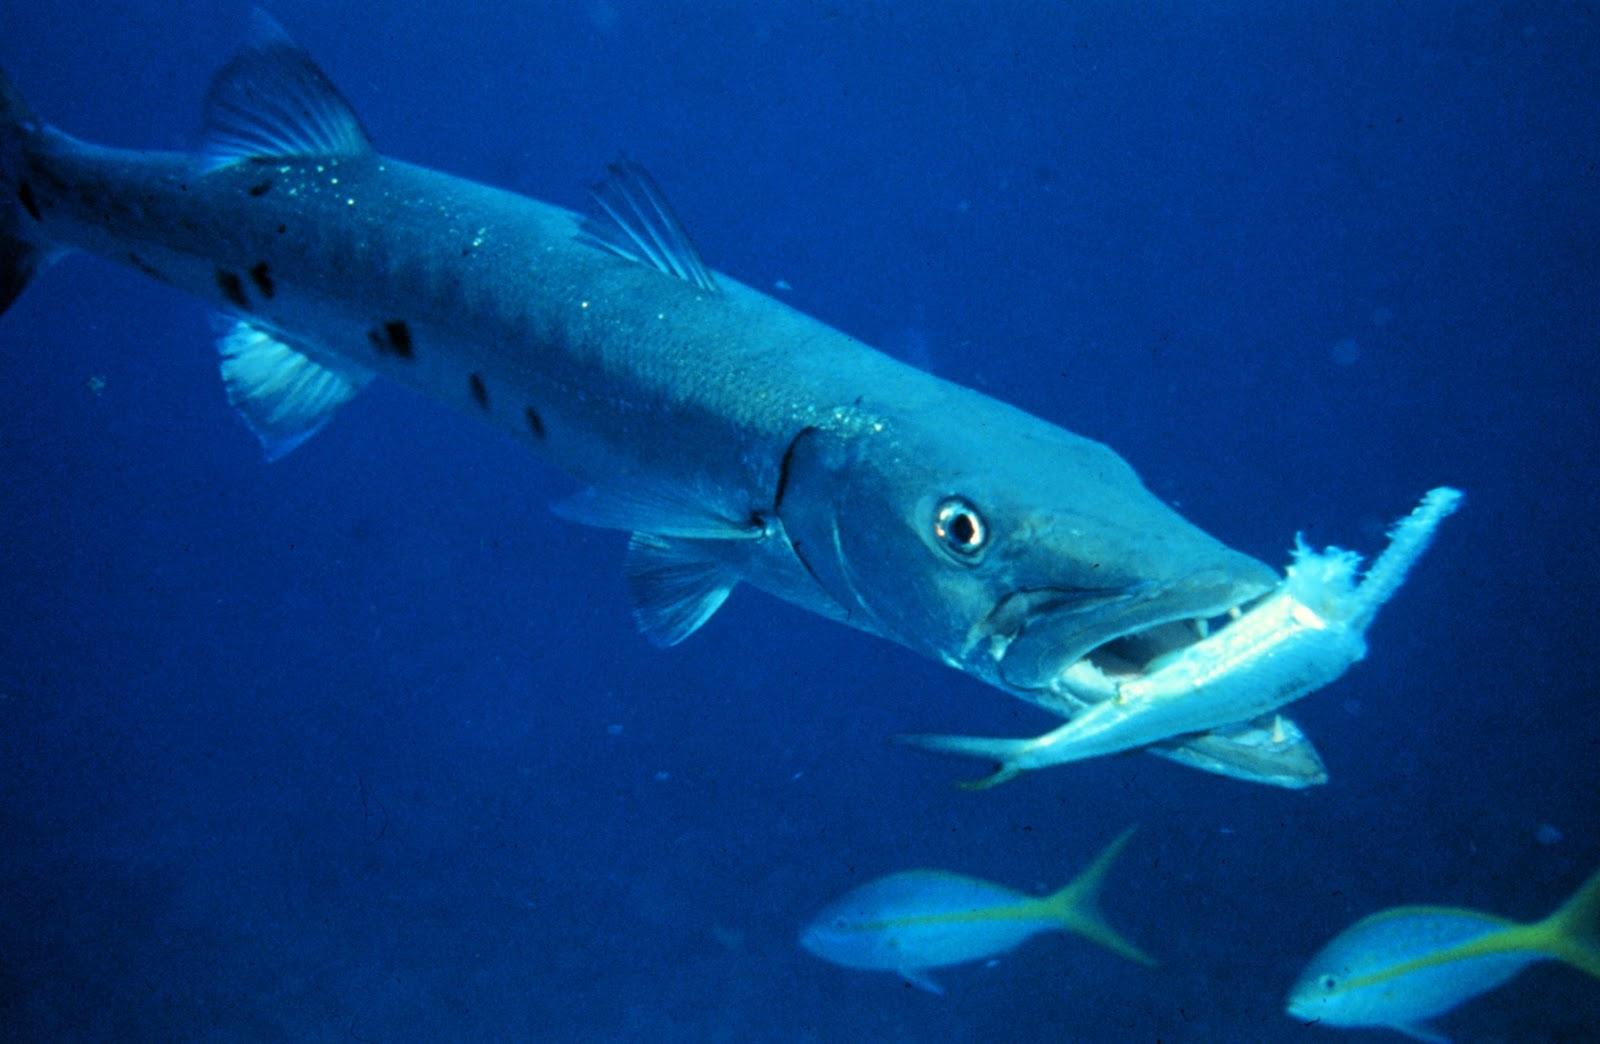 ghost hunting theories killer fish barracudas piranhas